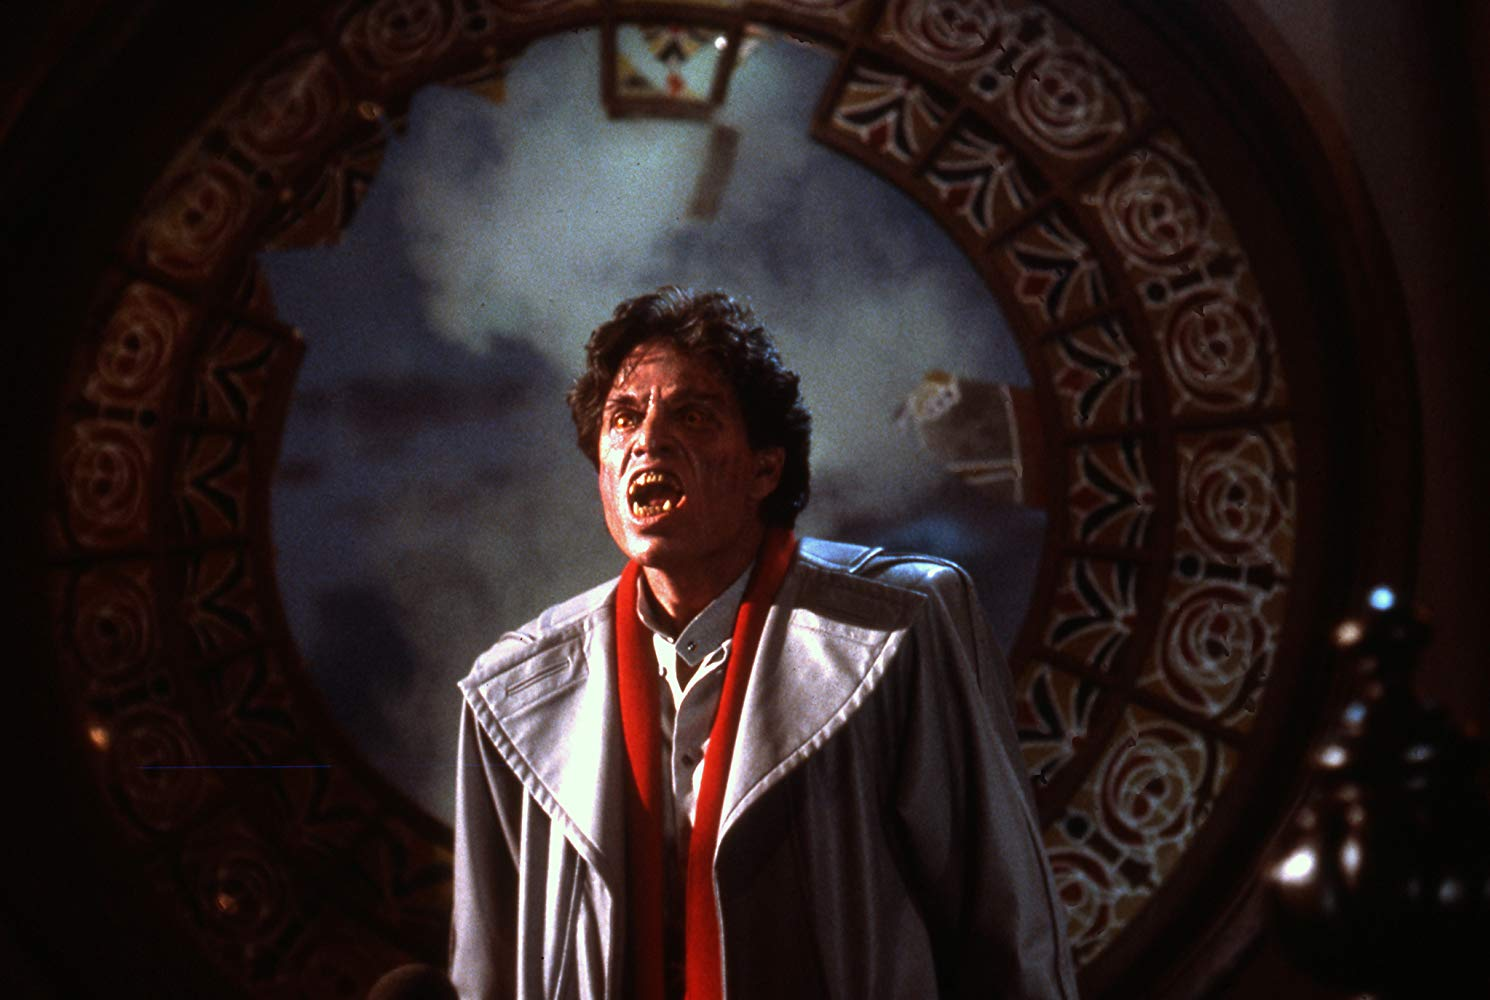 Chris Sarandon as the vampire Jerry Dandridge in Fright Night (1985)